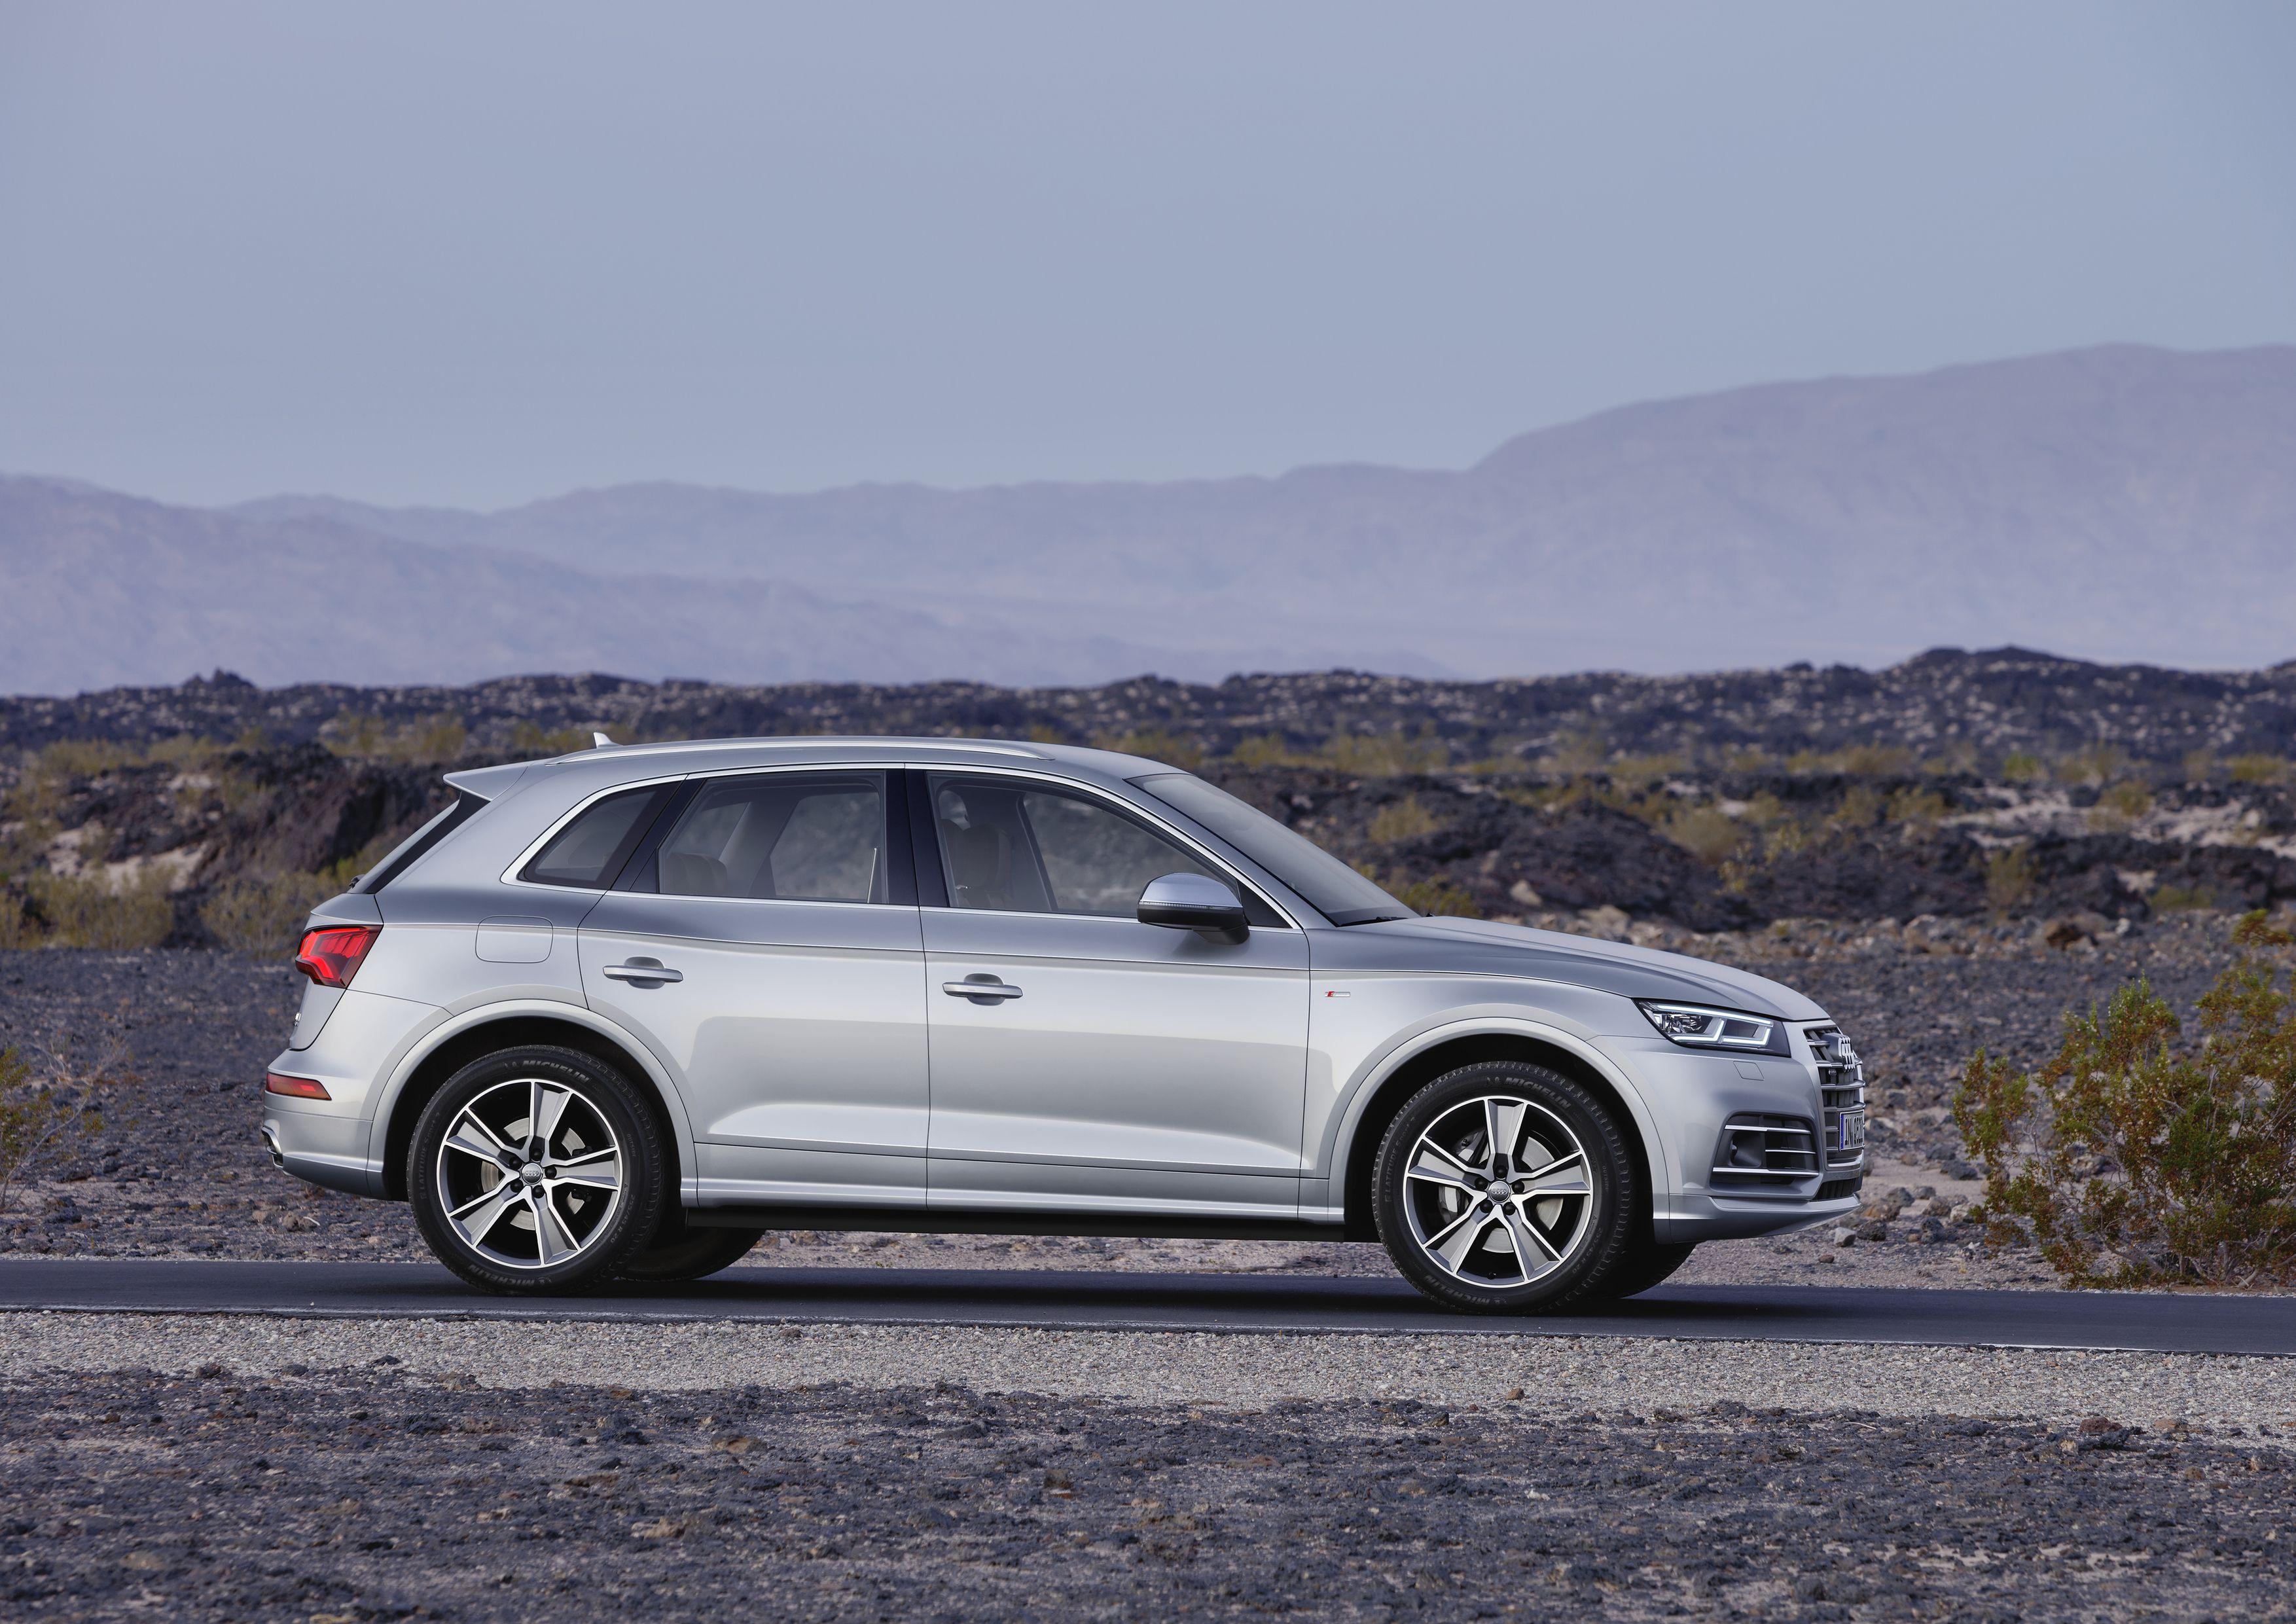 Video Carwow Reviews The New Audi Q5 Audi Pinterest Audi And Cars